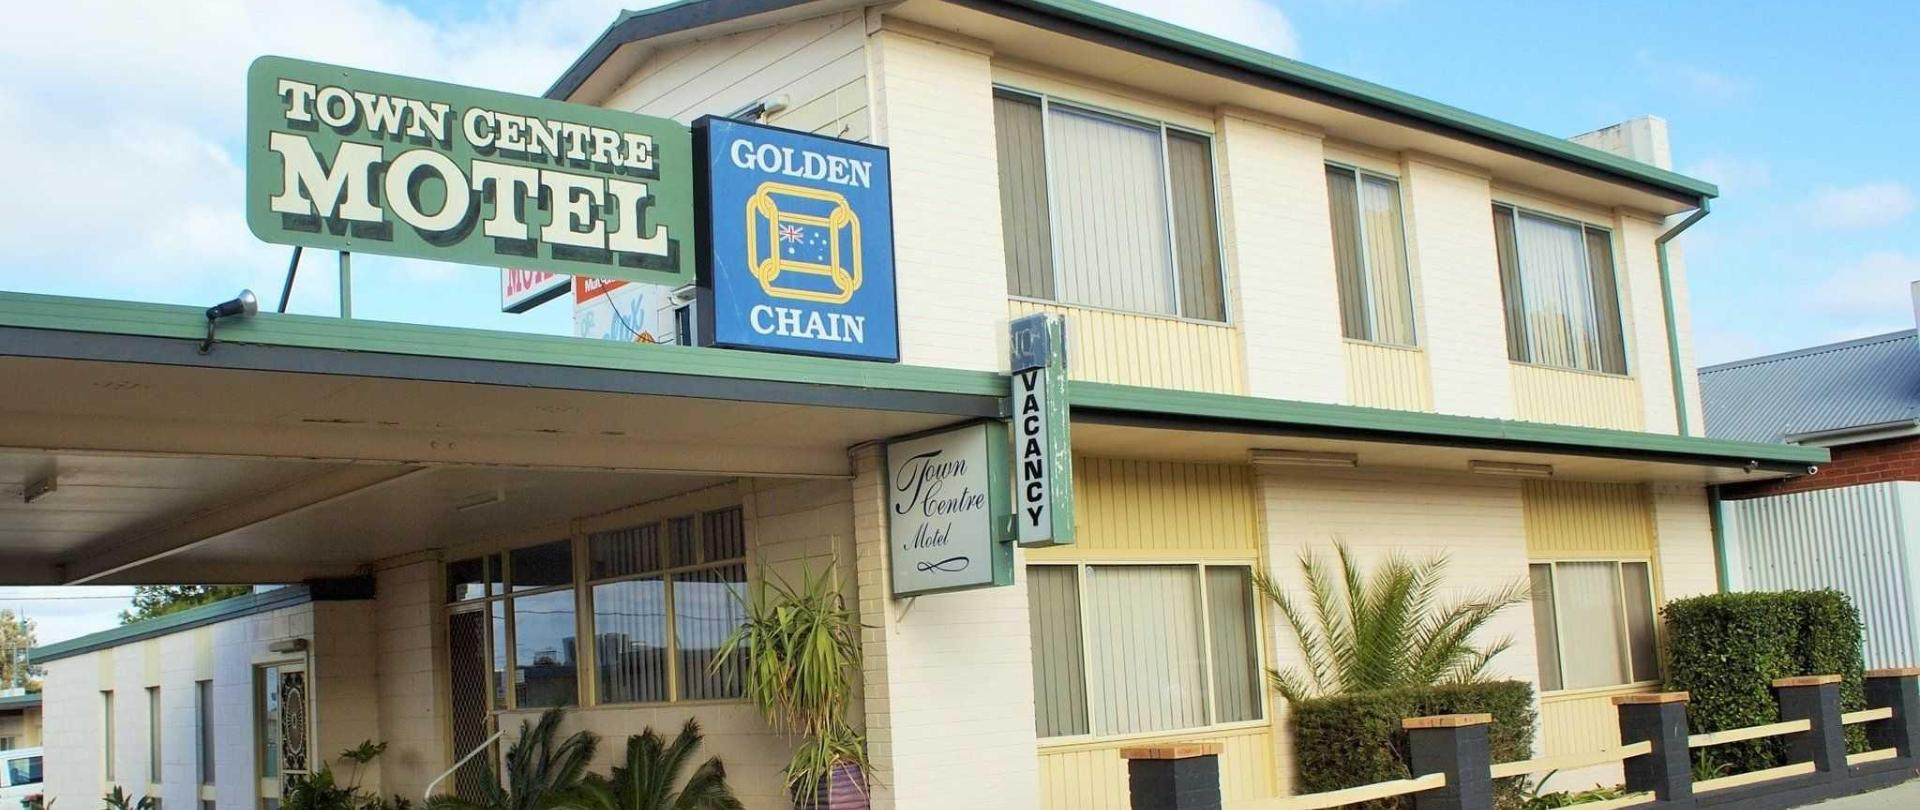 motel-entrance-3-2.jpg